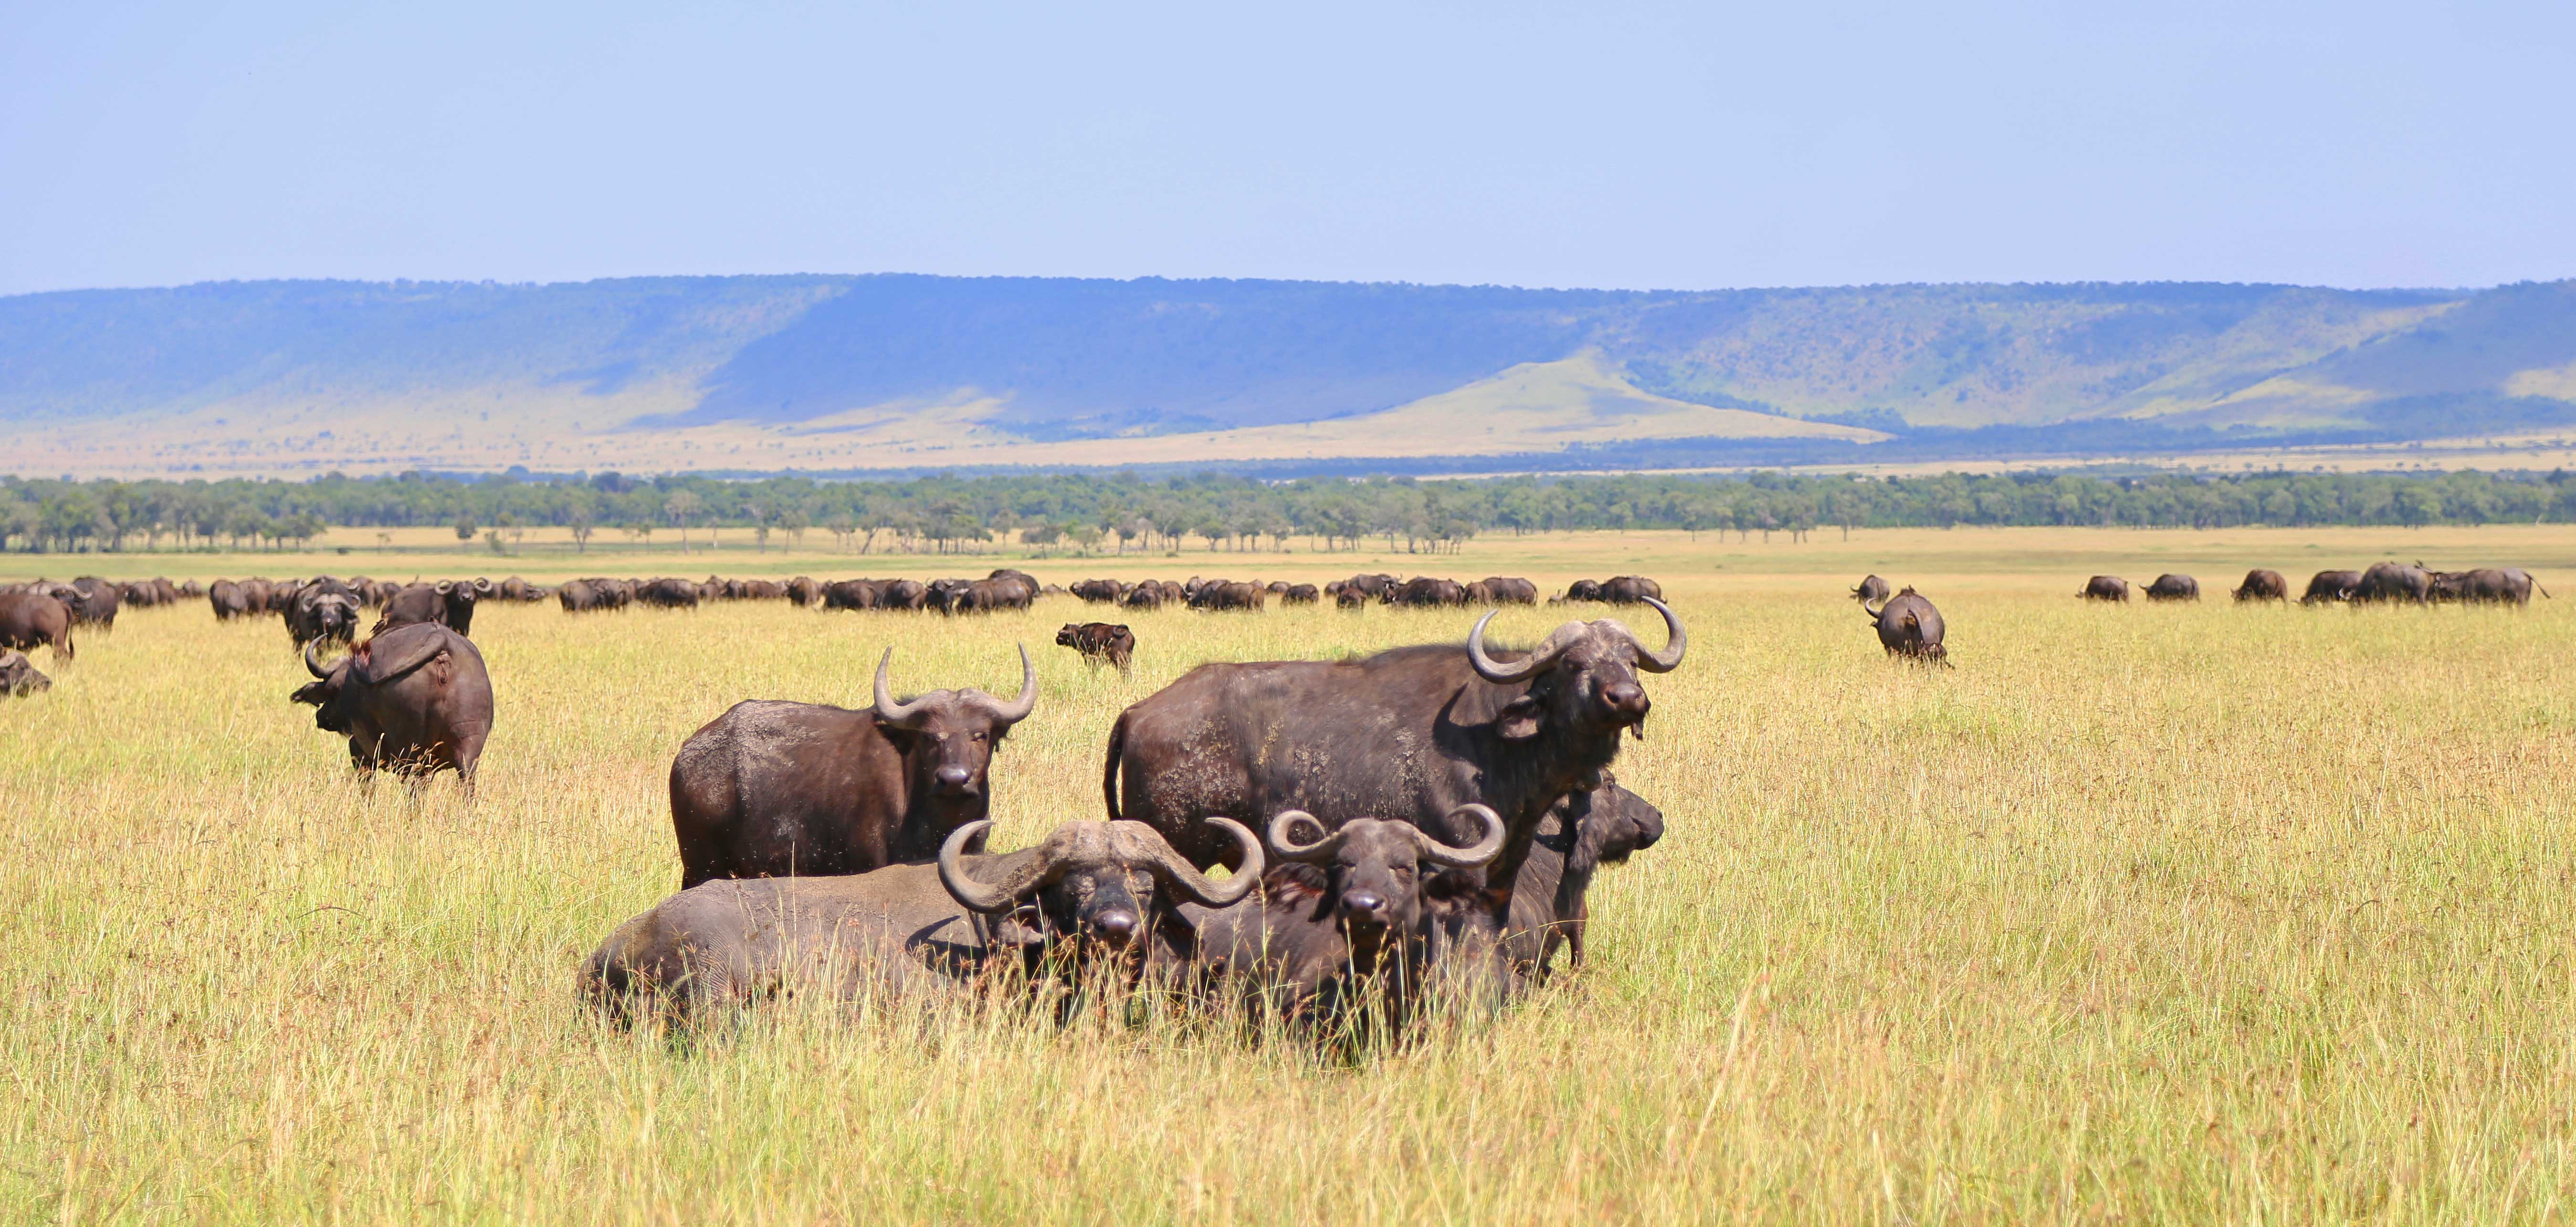 2 Day Tanzania Safari- Tarangire + Ngorongoro Crater